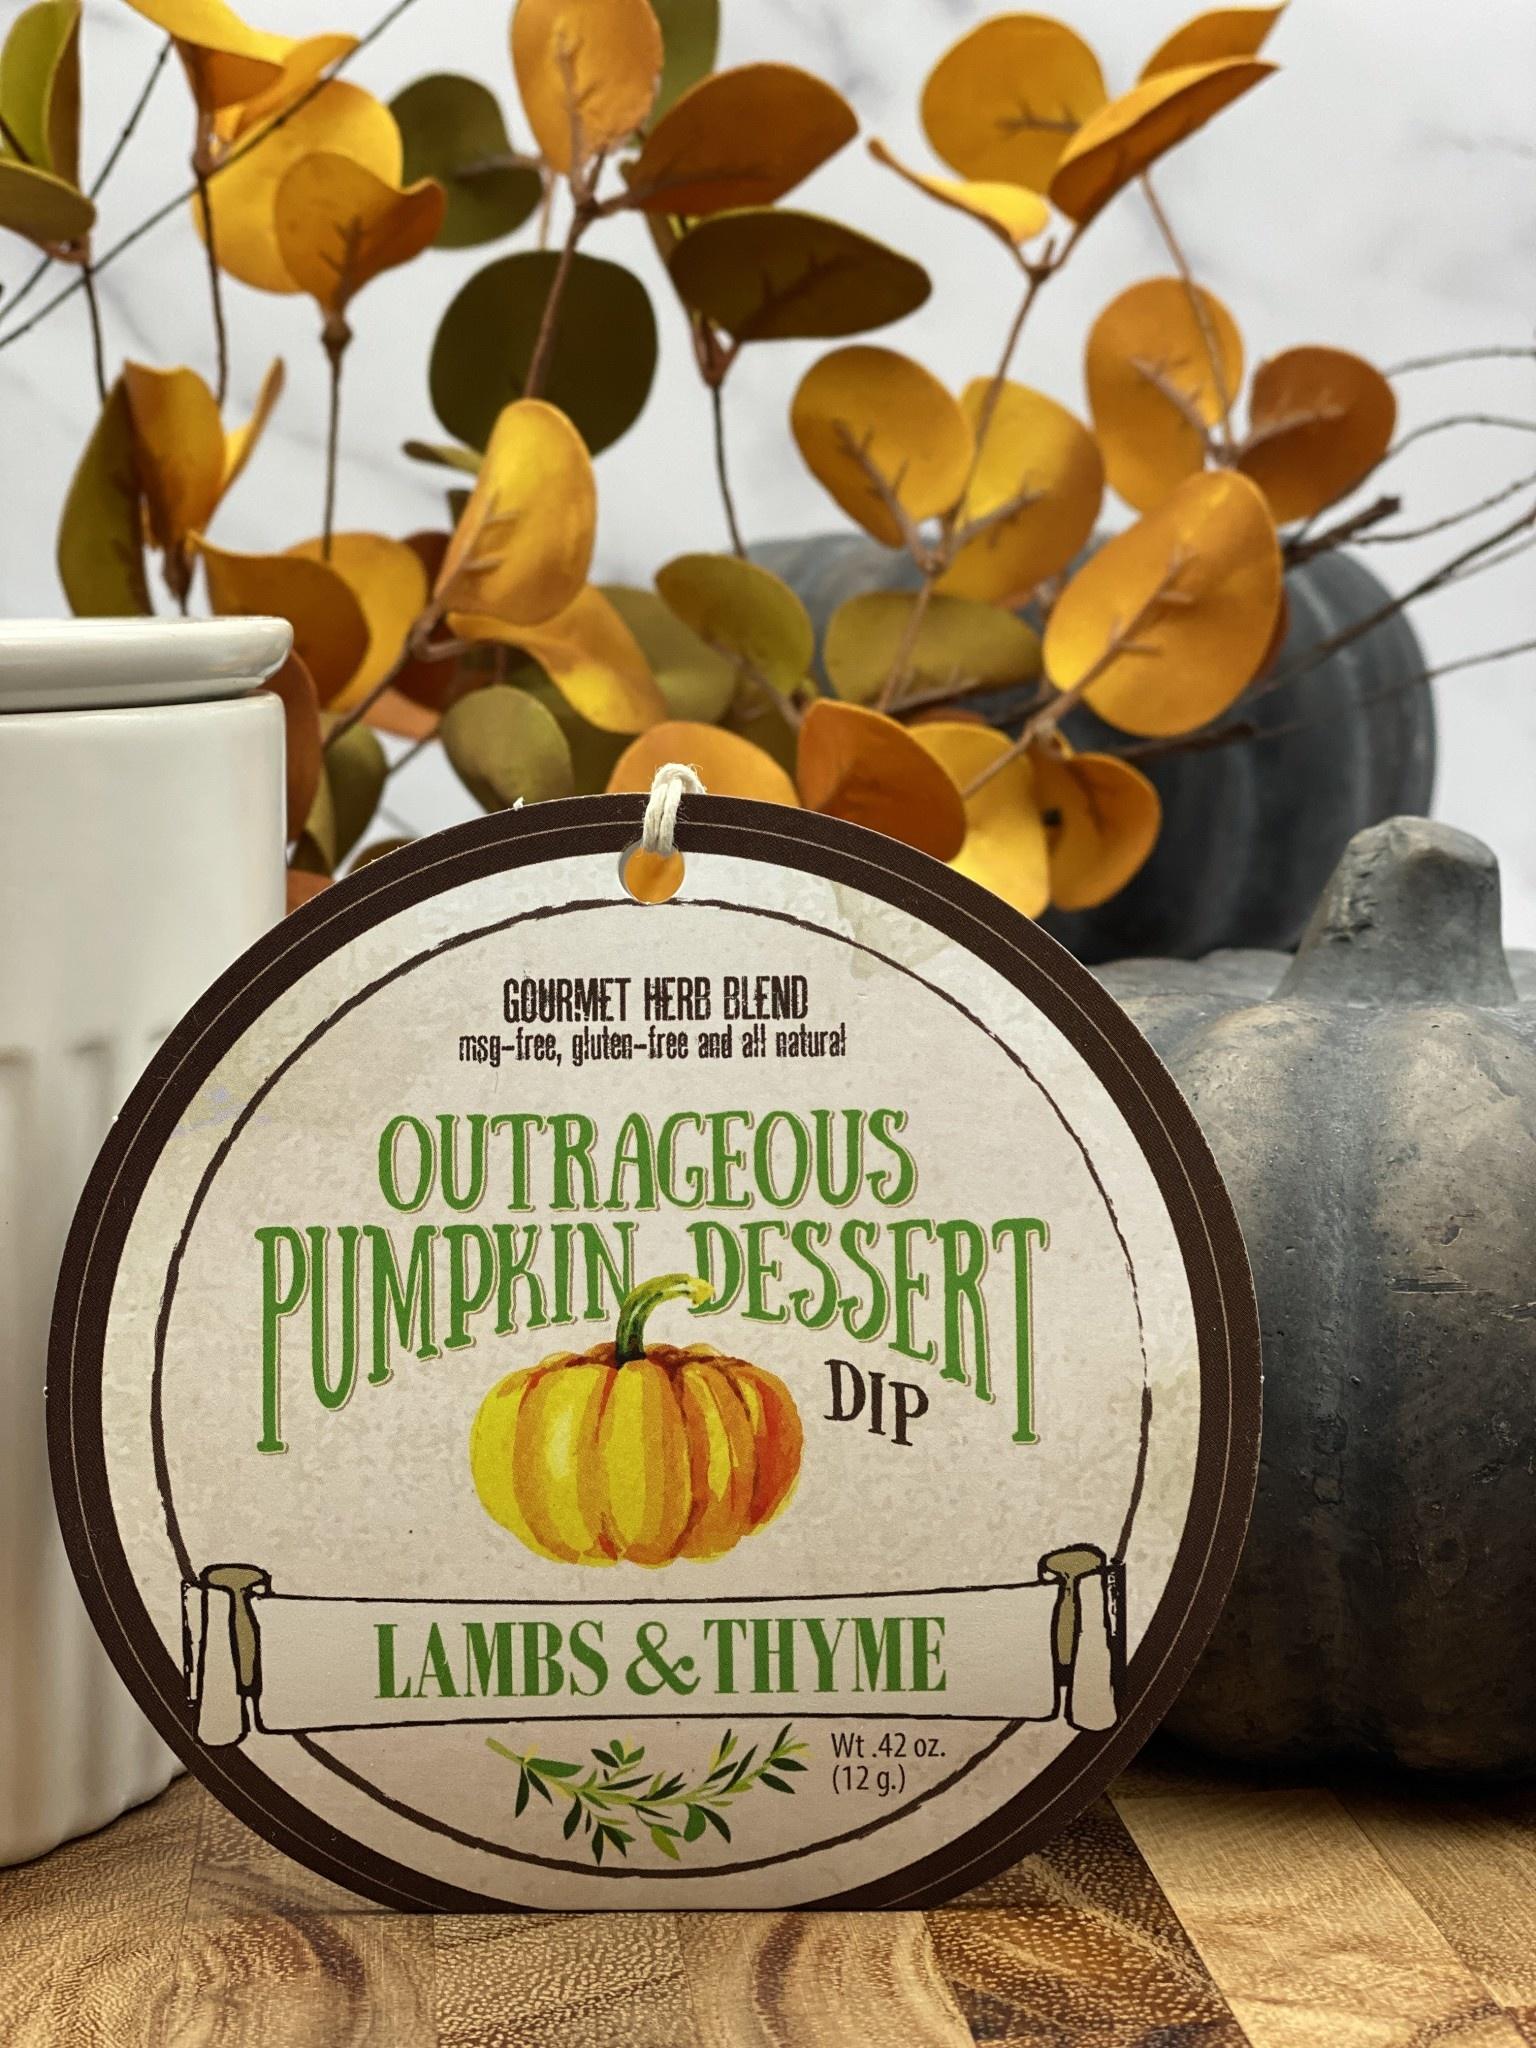 Lambs & Thyme Sweeter Dips Pumpkin